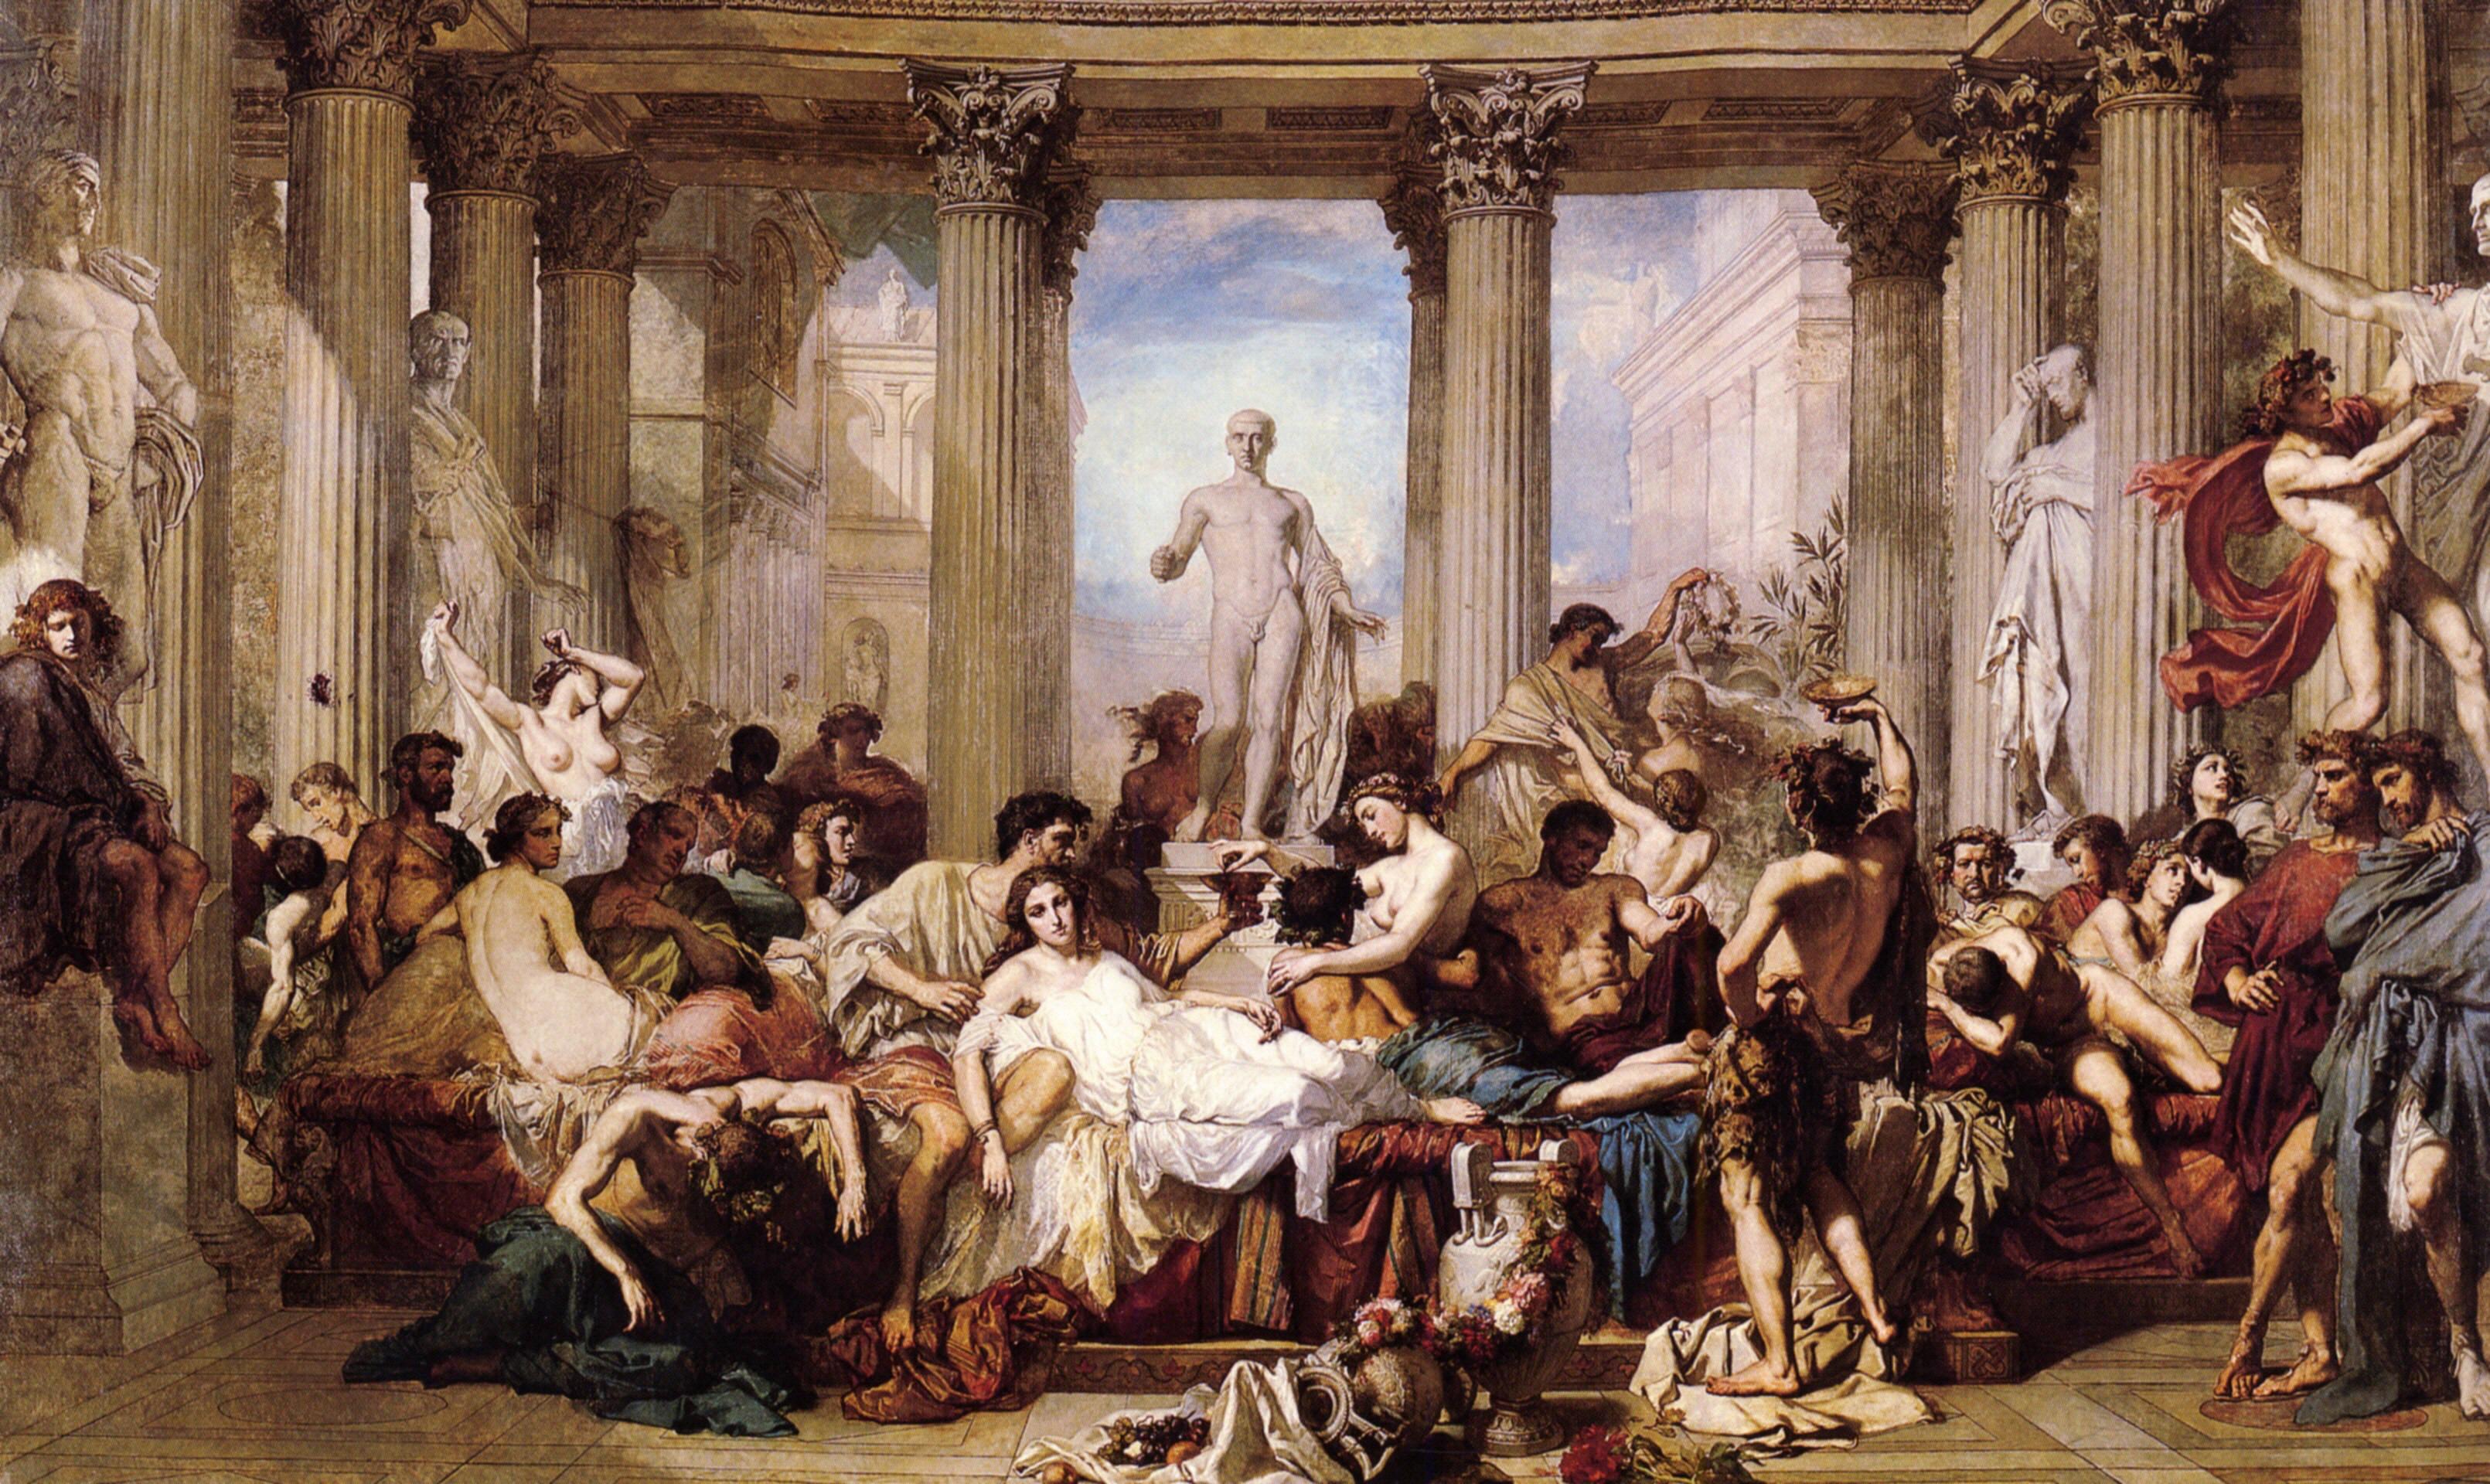 Title. картины, классический, Томас Couture, Римляне в упадок империи - обо